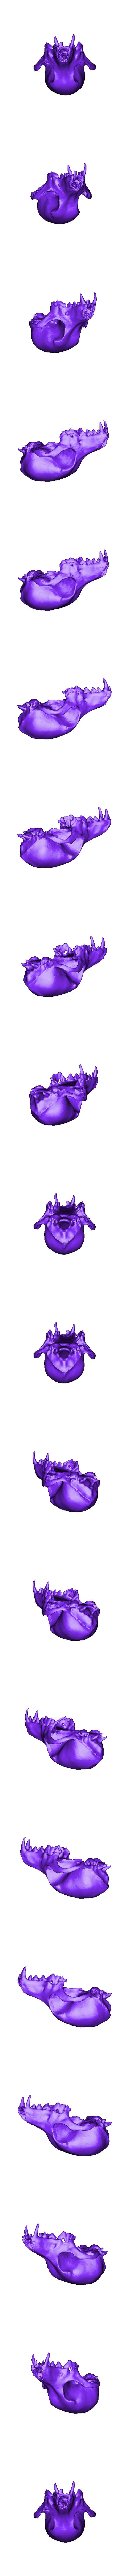 Bitey_Reconstructed.stl Download free STL file Bitey the Dog Skull • 3D printer template, AlbertKhan3D